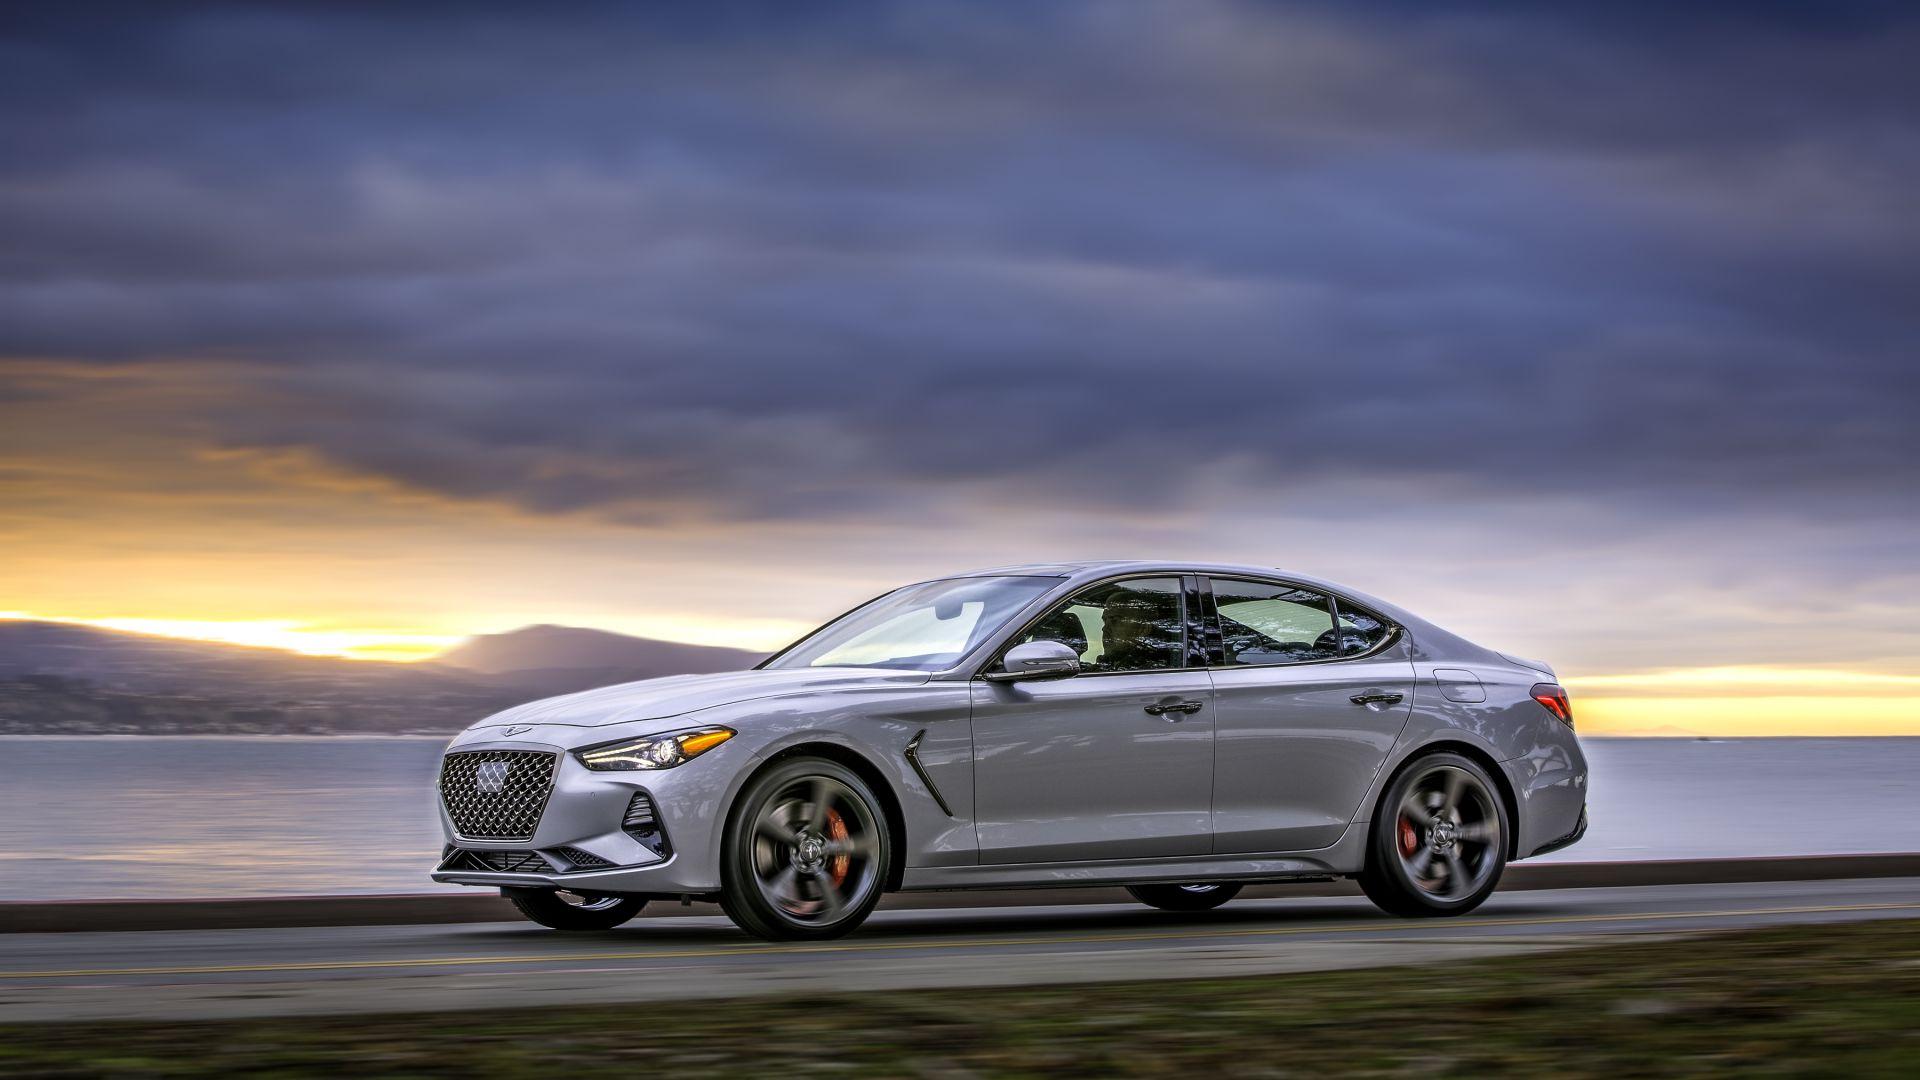 Luxury Cars 2019: Wallpaper Genesis G70, 2019 Cars, Luxury Cars, 4K, Cars